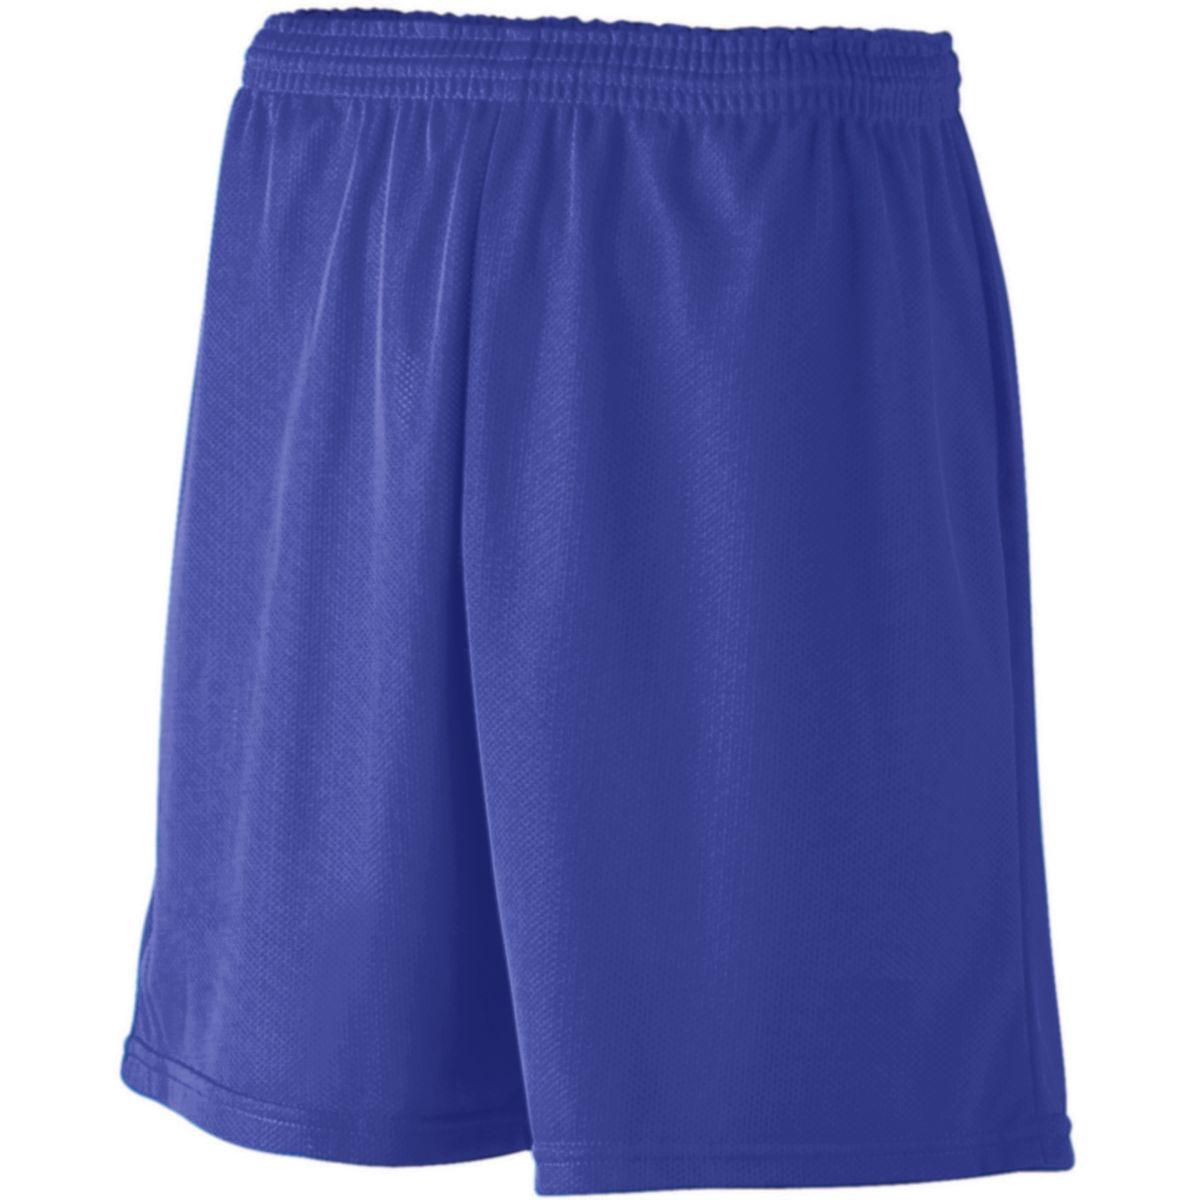 Augusta Mini Mesh League Short Purple Xl - image 1 of 1